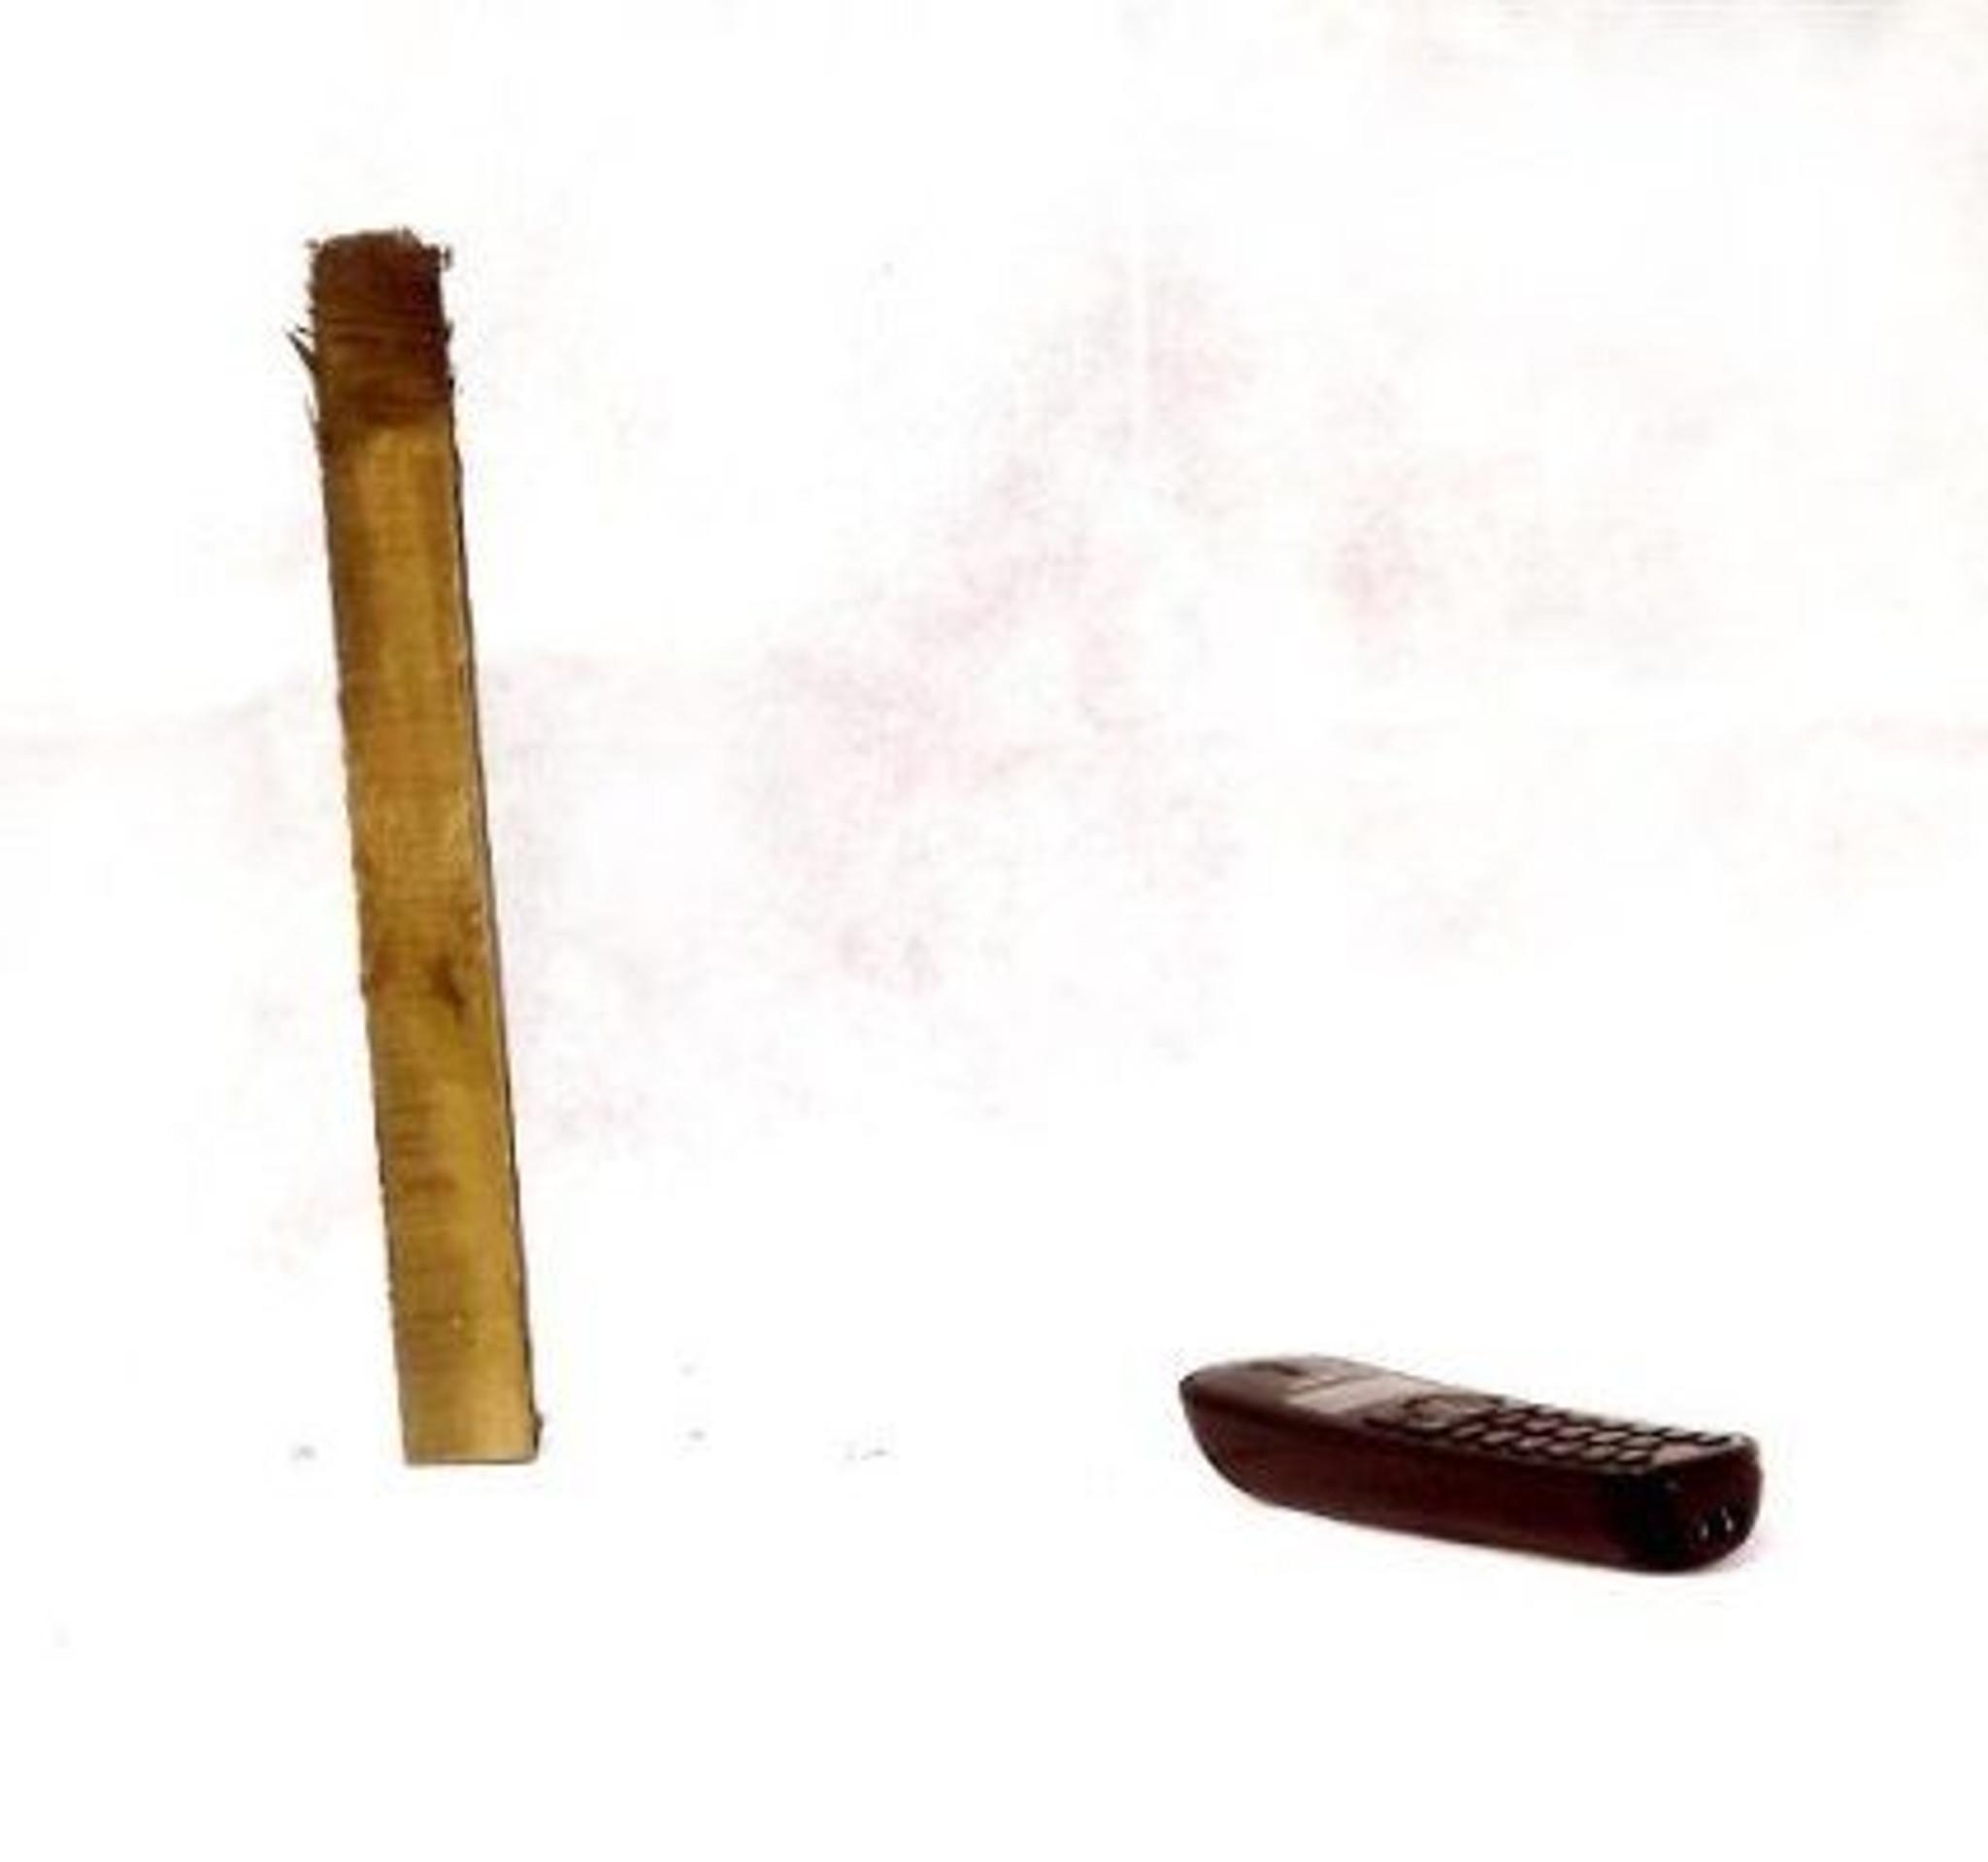 Timber pressure treated pegs